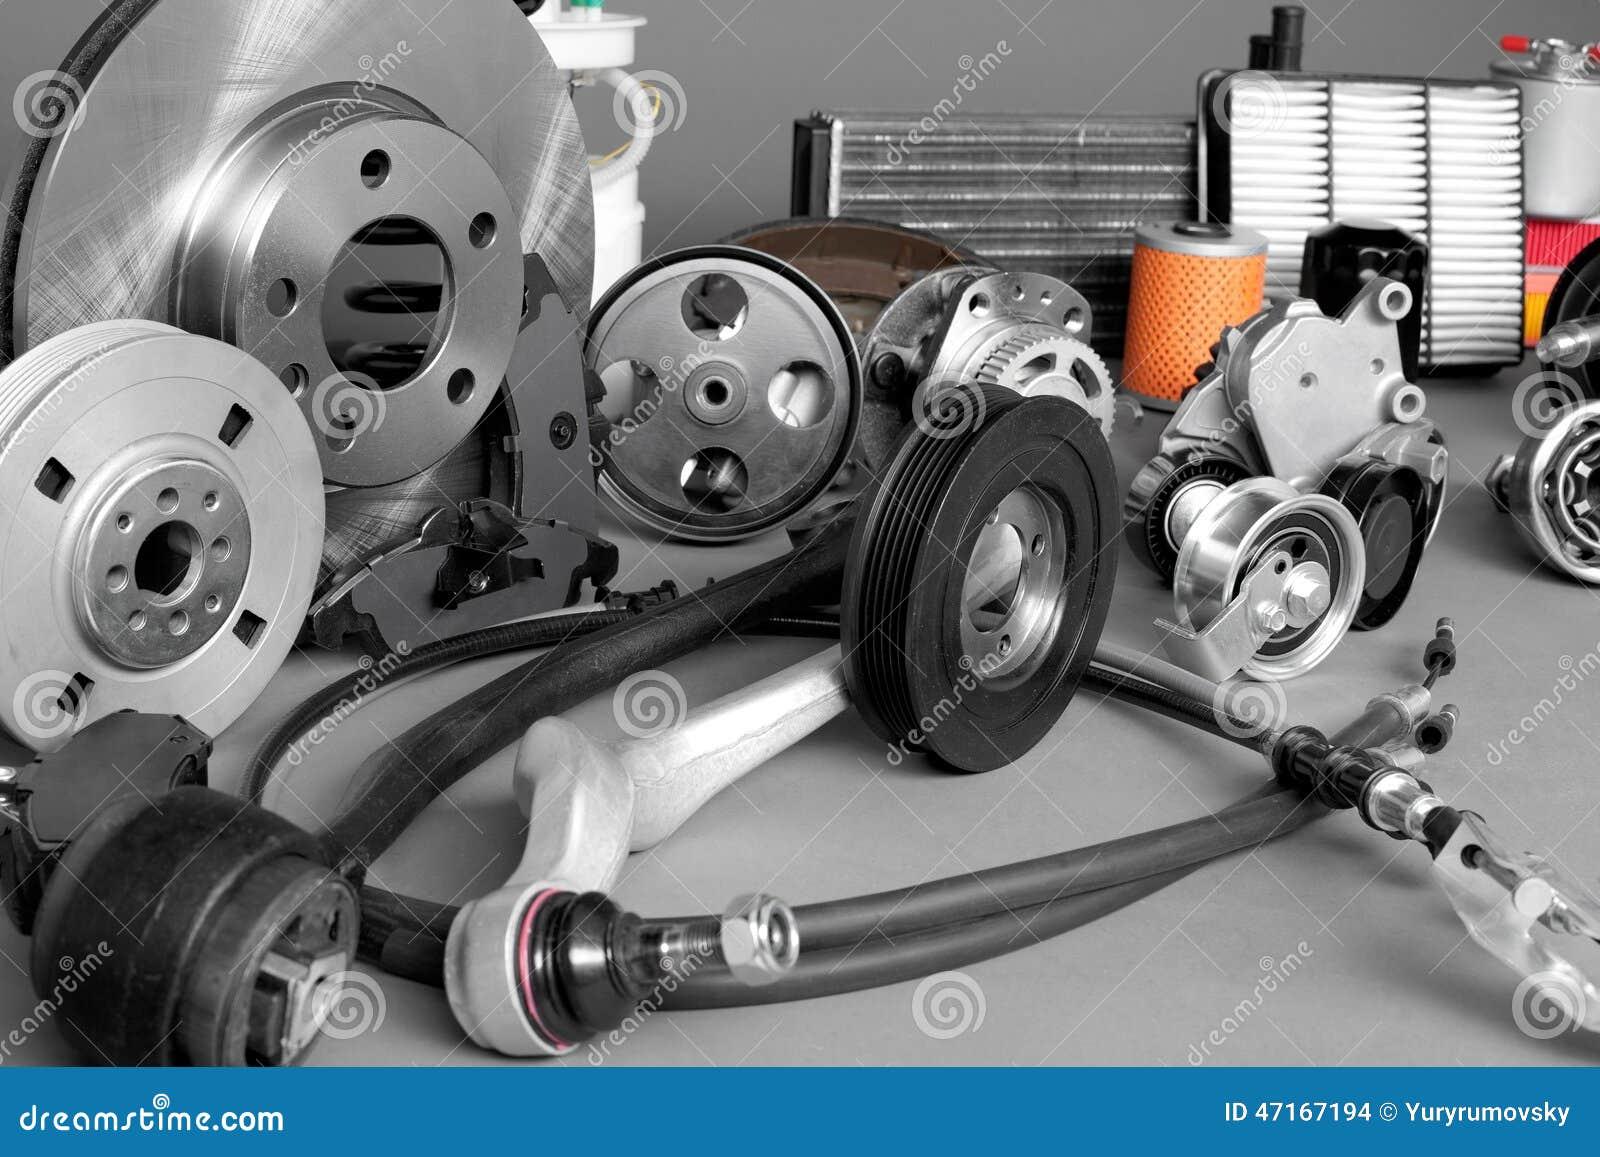 New Car Parts : Auto parts stock photo image of metal automobile